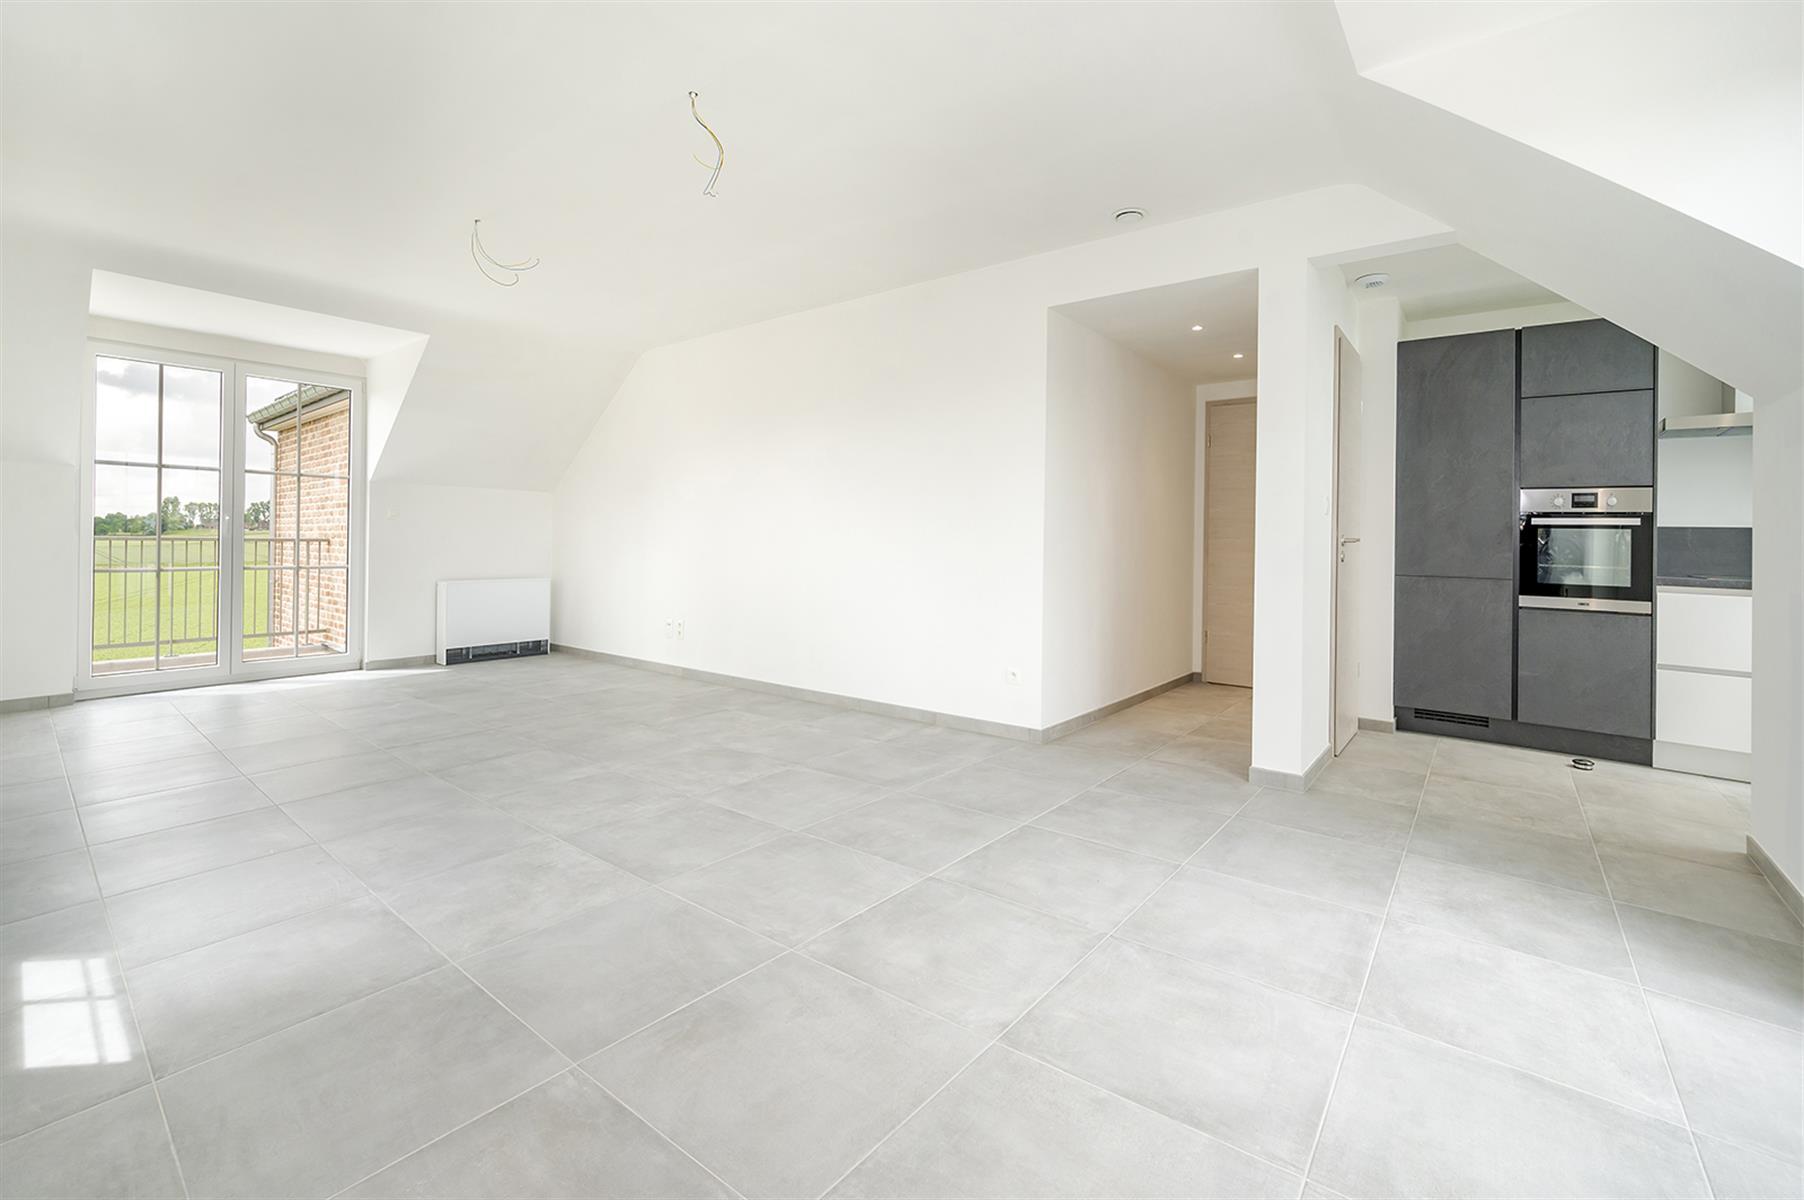 Appartement avec jardin - Huy - #3807249-6